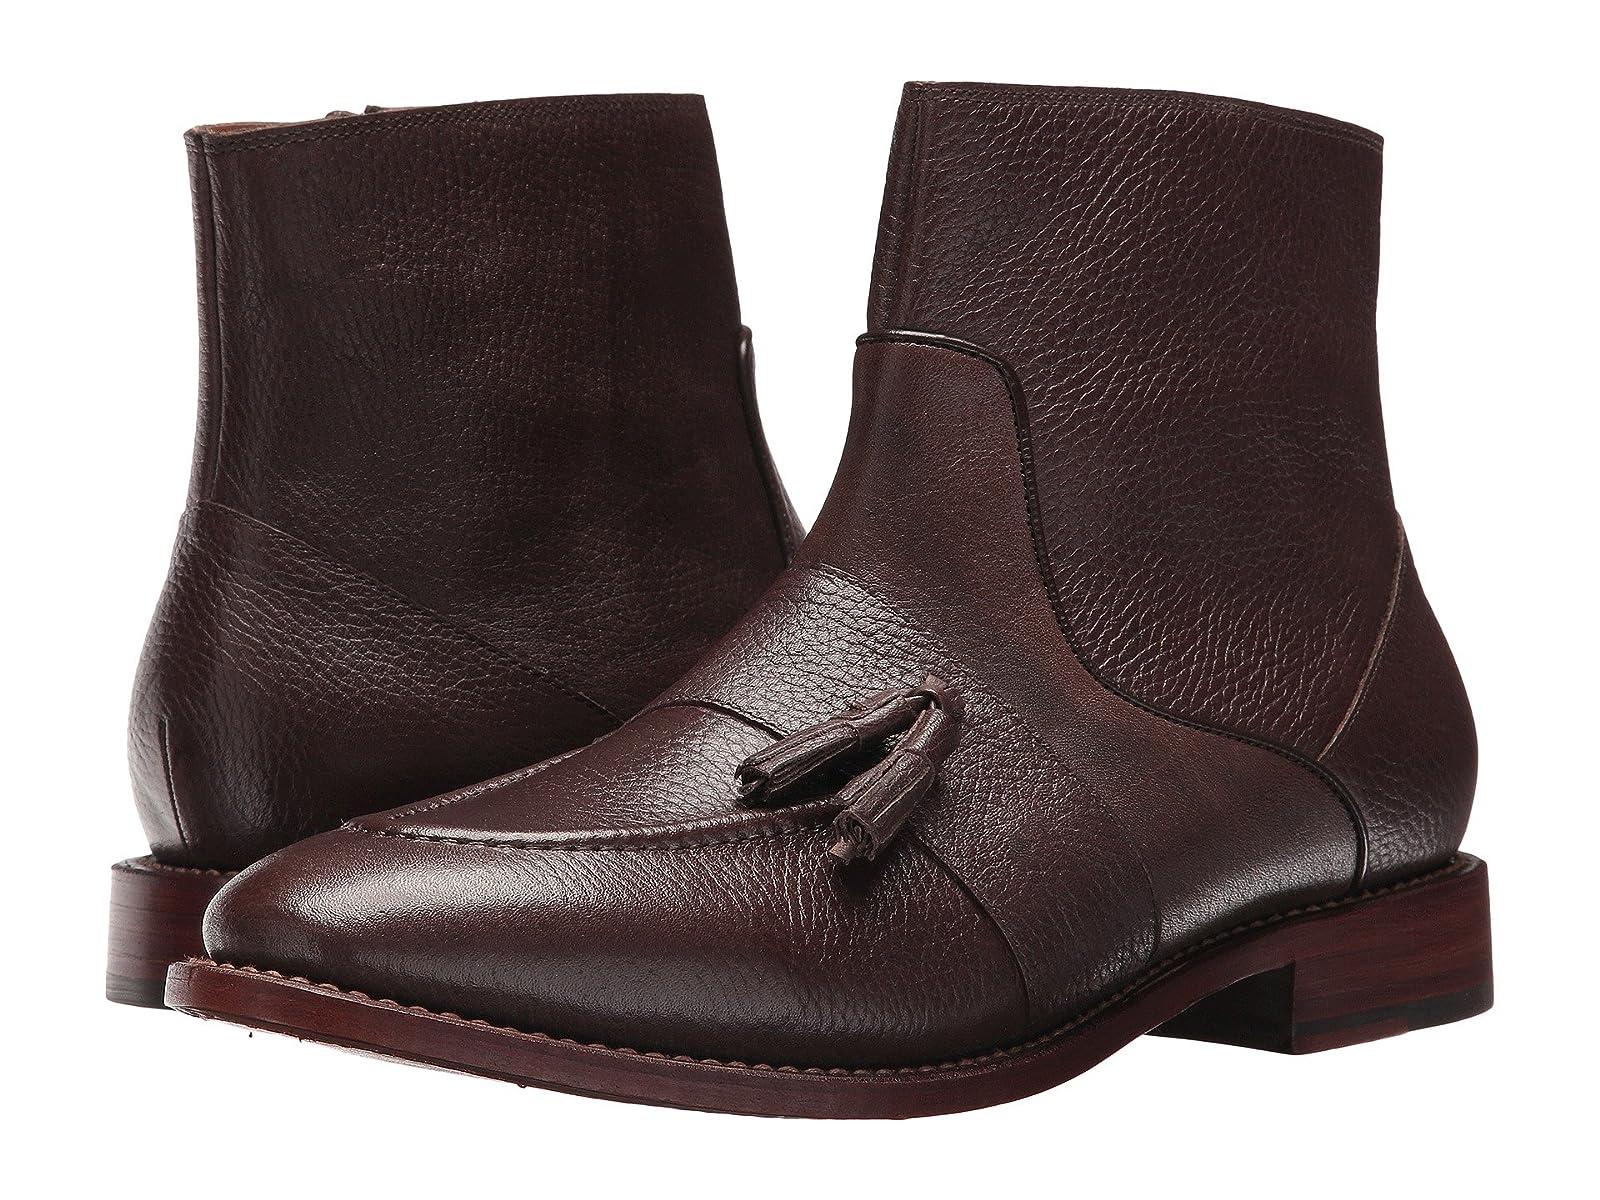 Michael Bastian Gray Label Sidney Tassel Zip BootCheap and distinctive eye-catching shoes